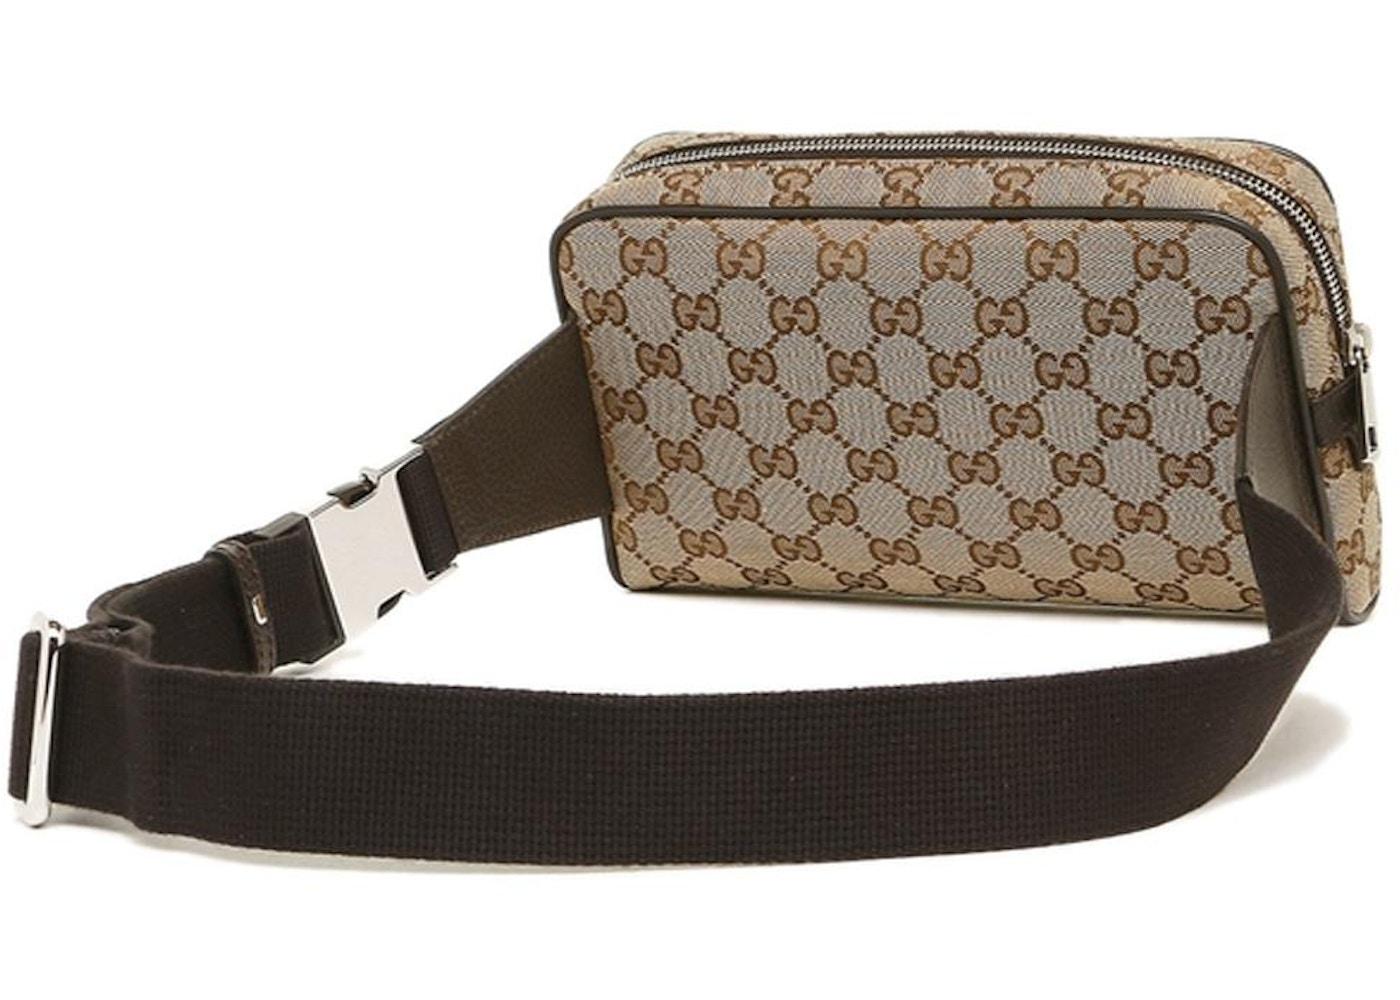 3b63bcae758 Buy   Sell Gucci Luxury Handbags